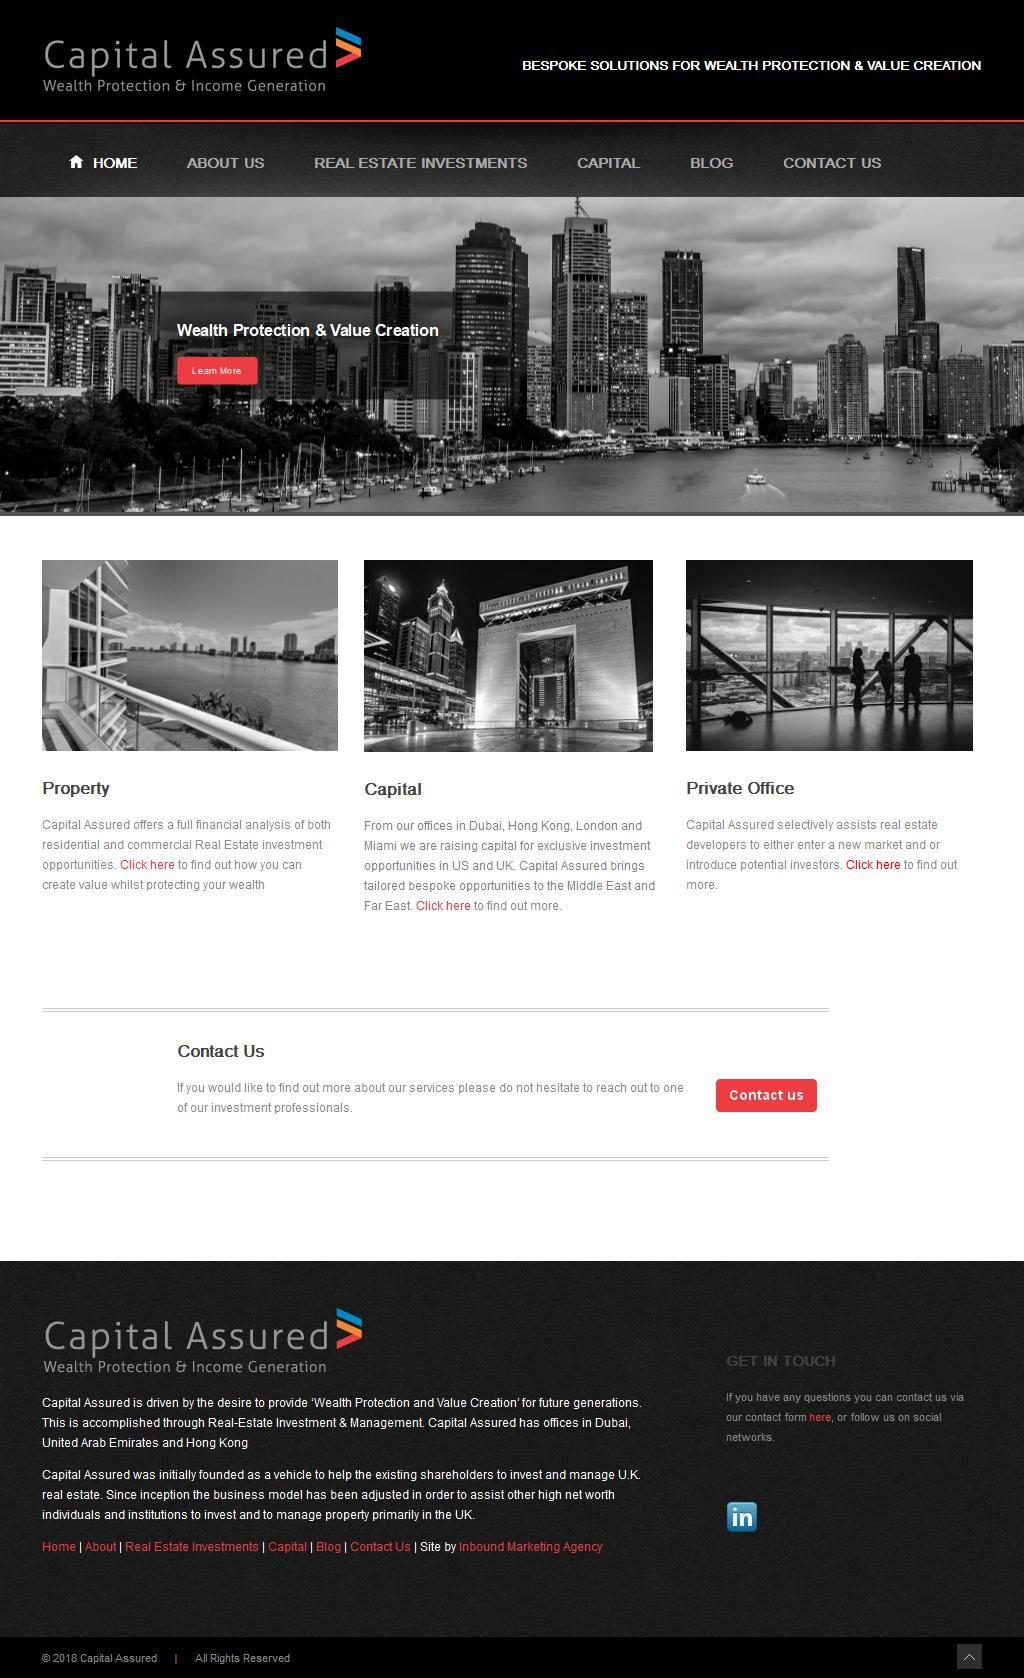 Capital Assured Company Boulevard Plaza Tower 1, 4b